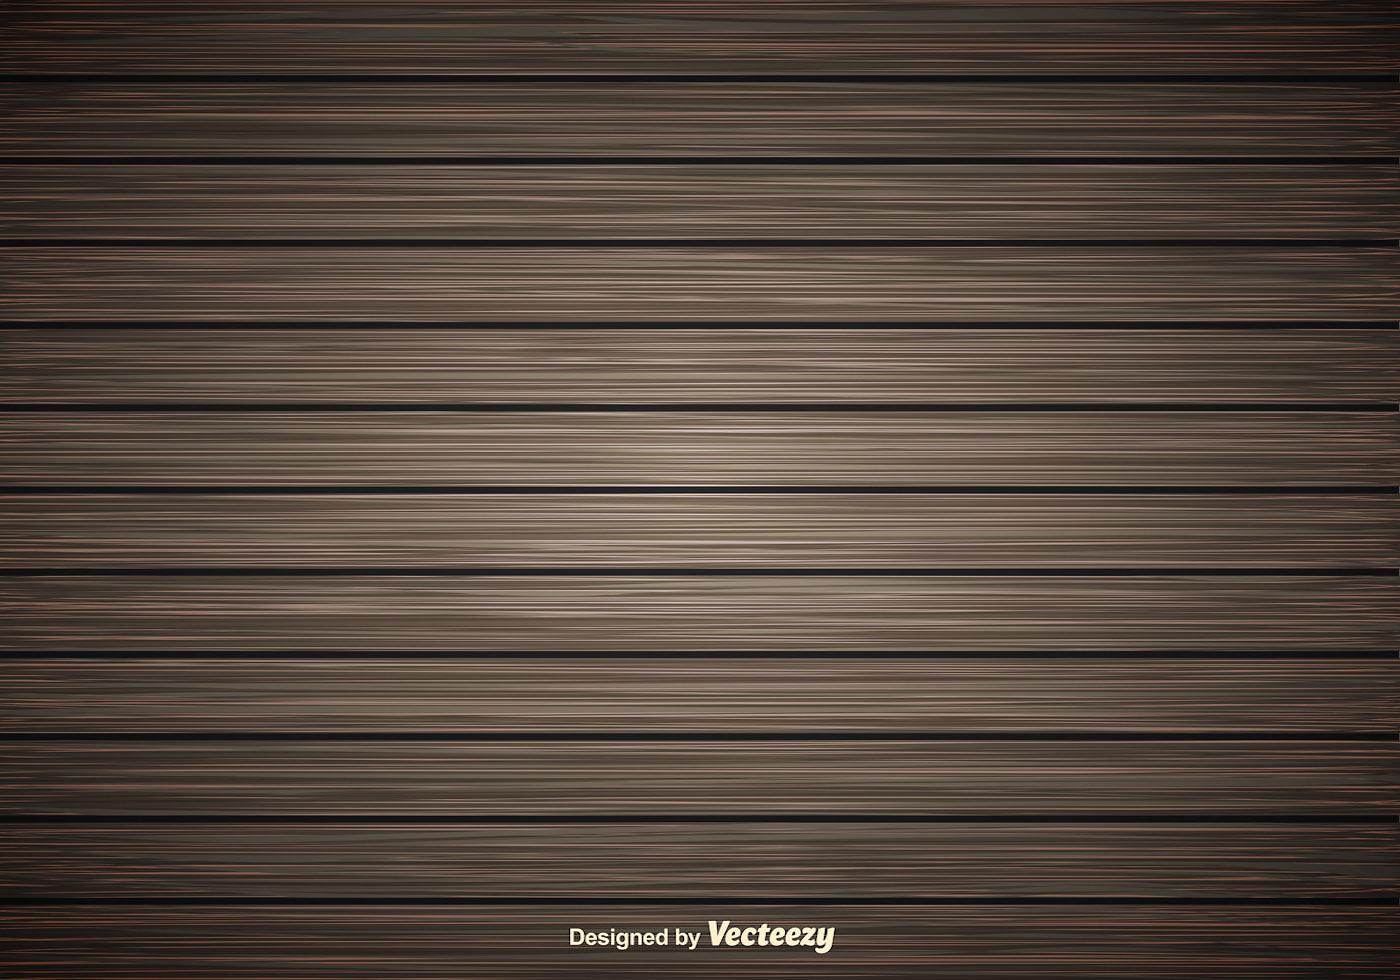 Dark Wooden Planks Vector Background Download Free